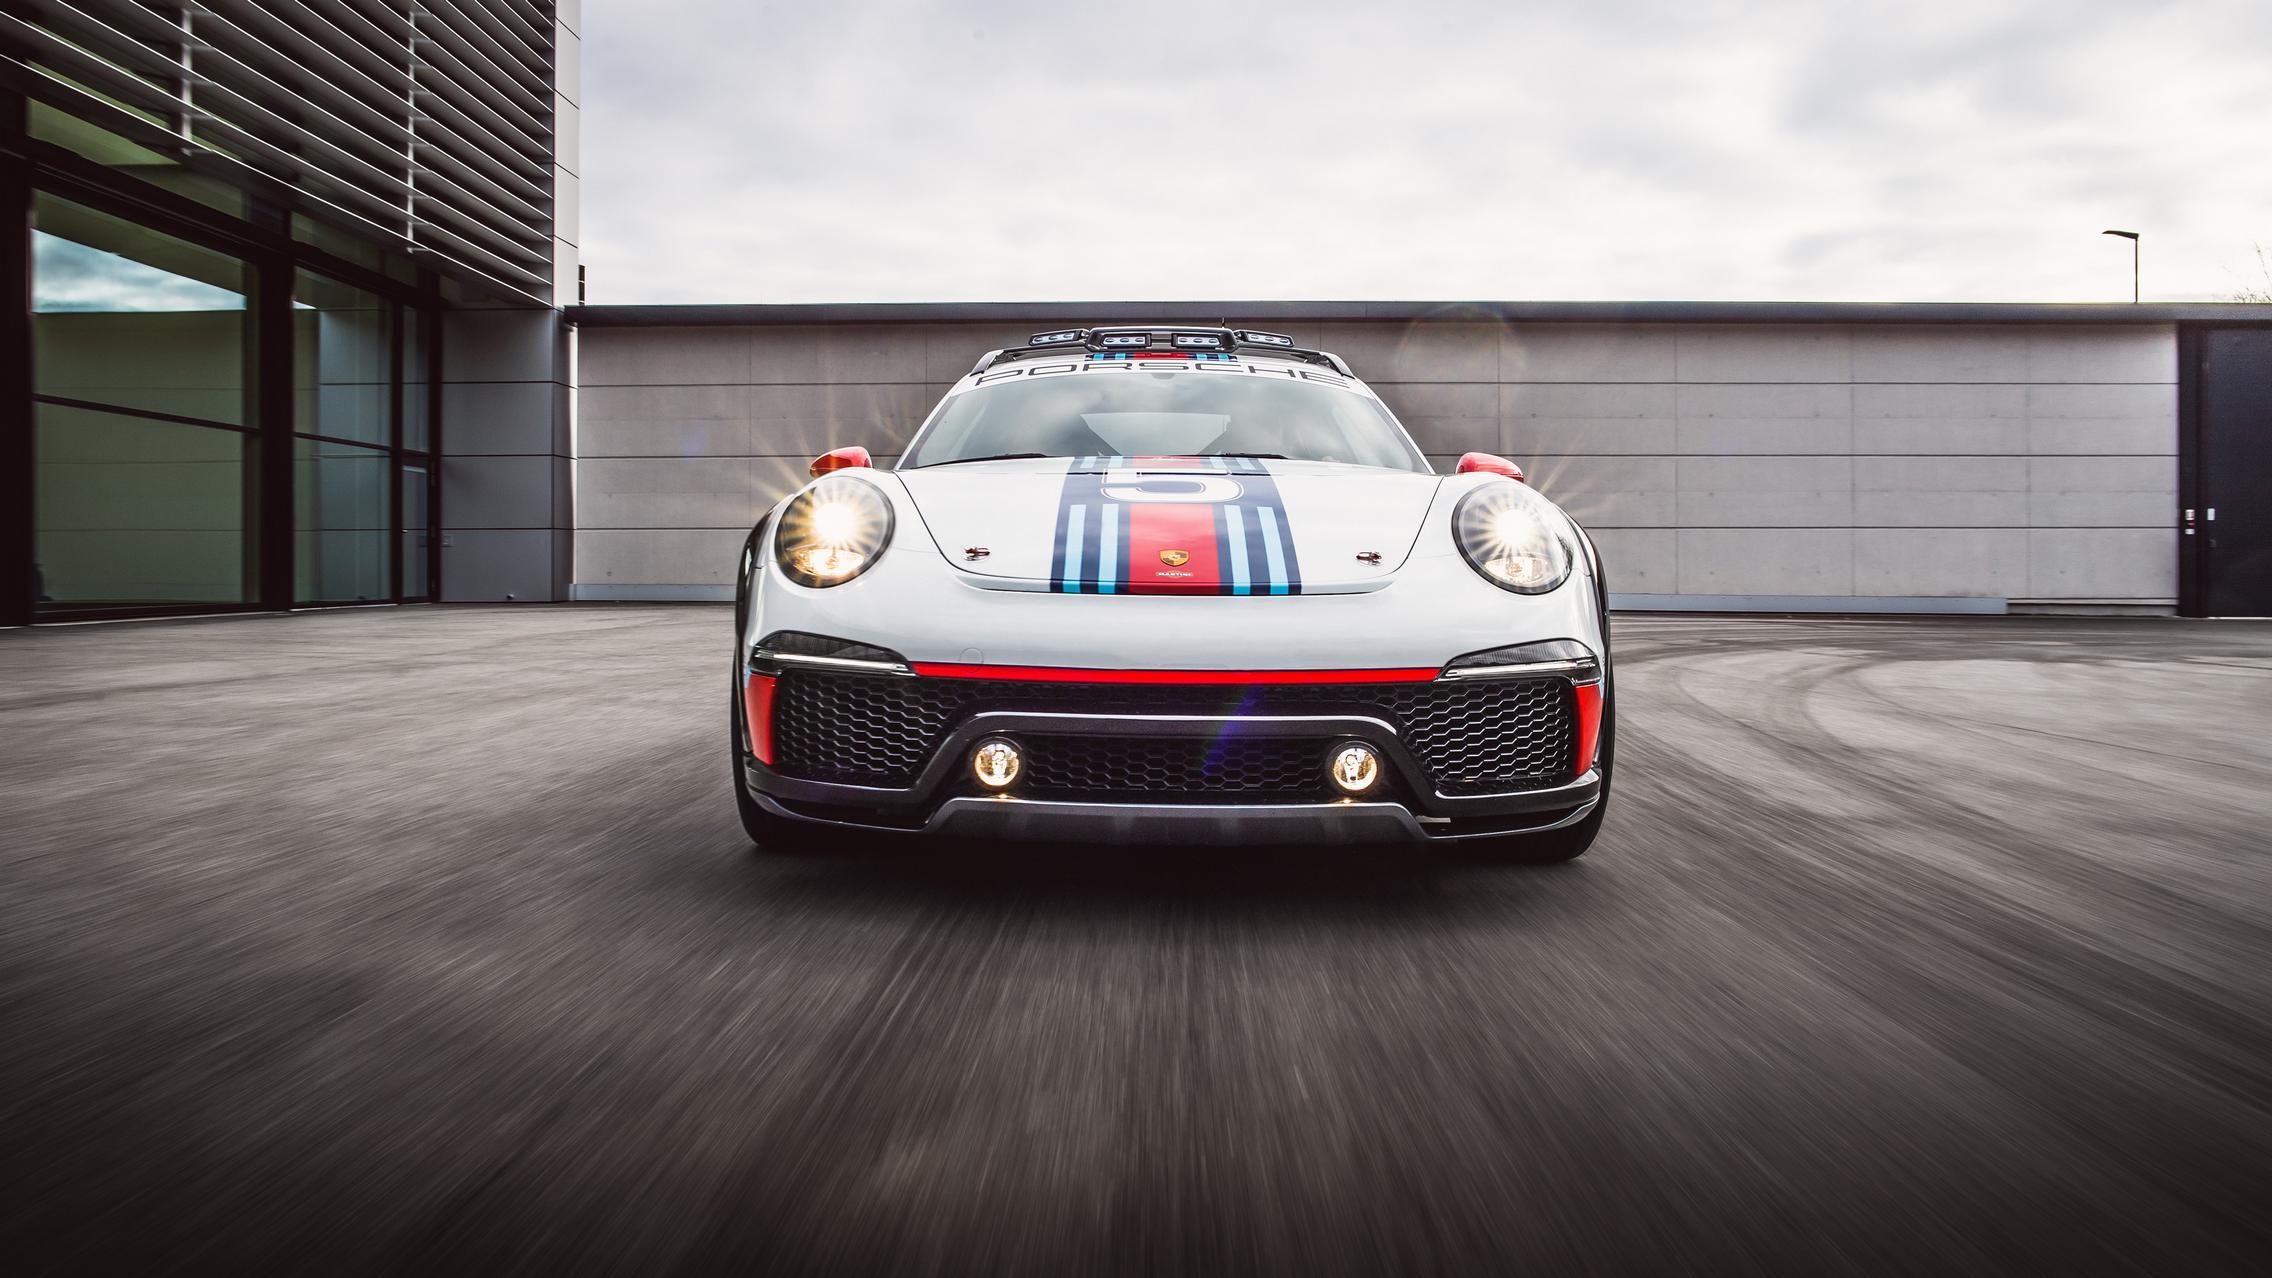 Porsche 911 Vision Safari front